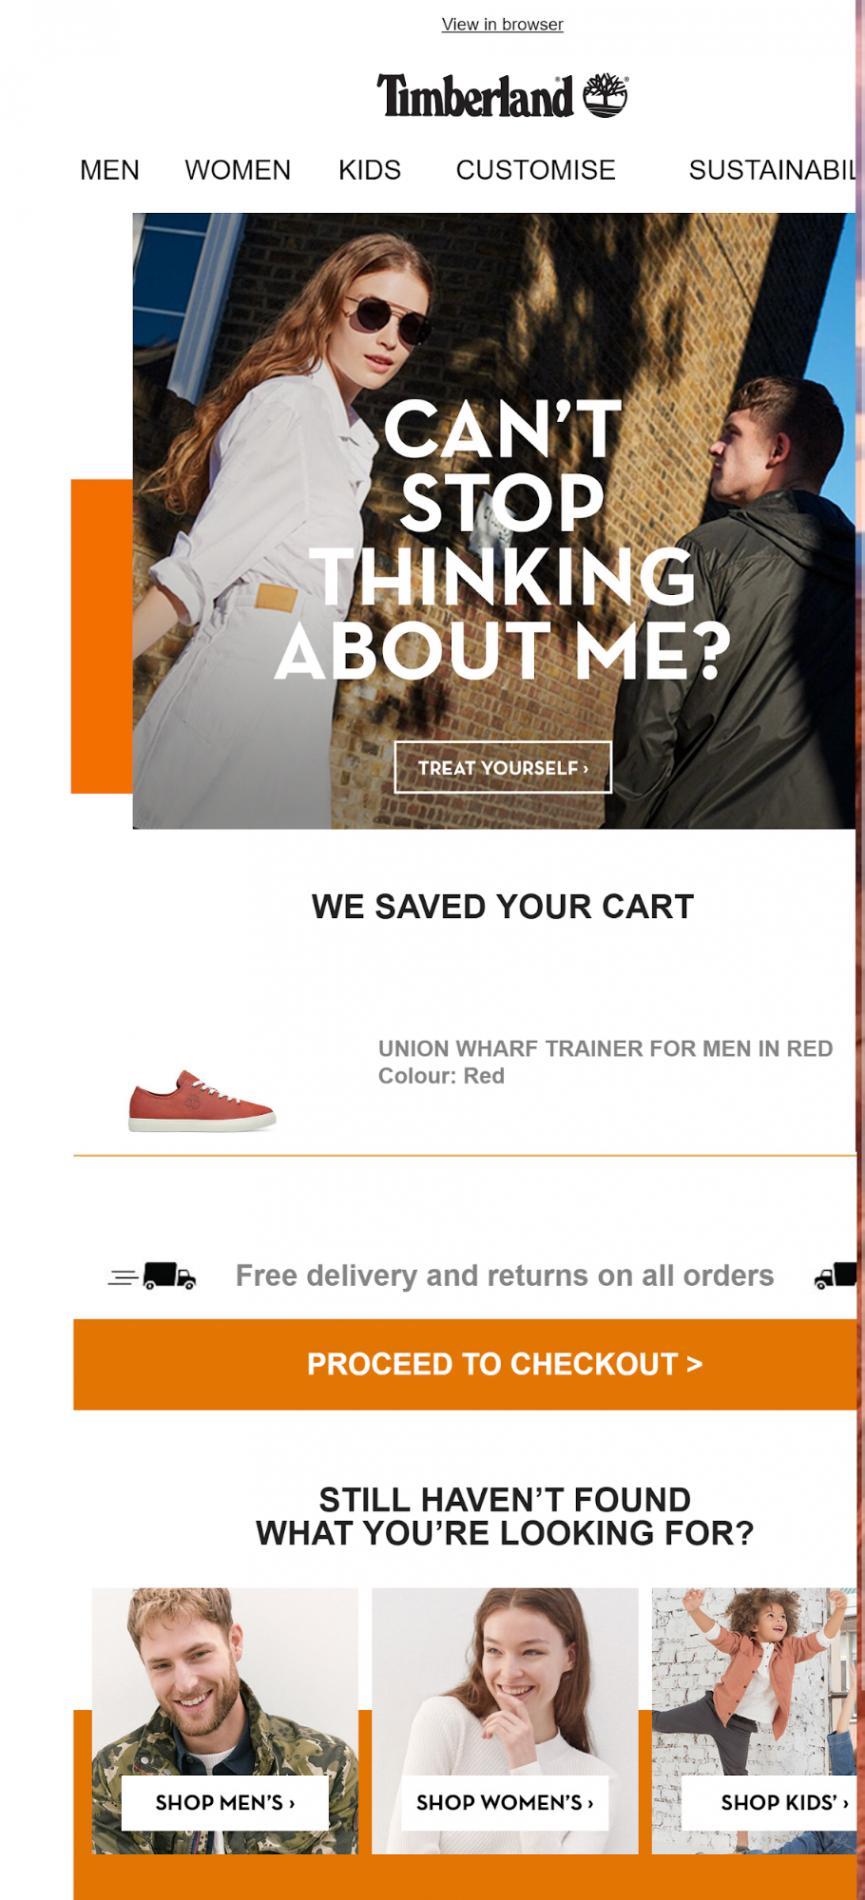 Timberland abandoned cart email marketing